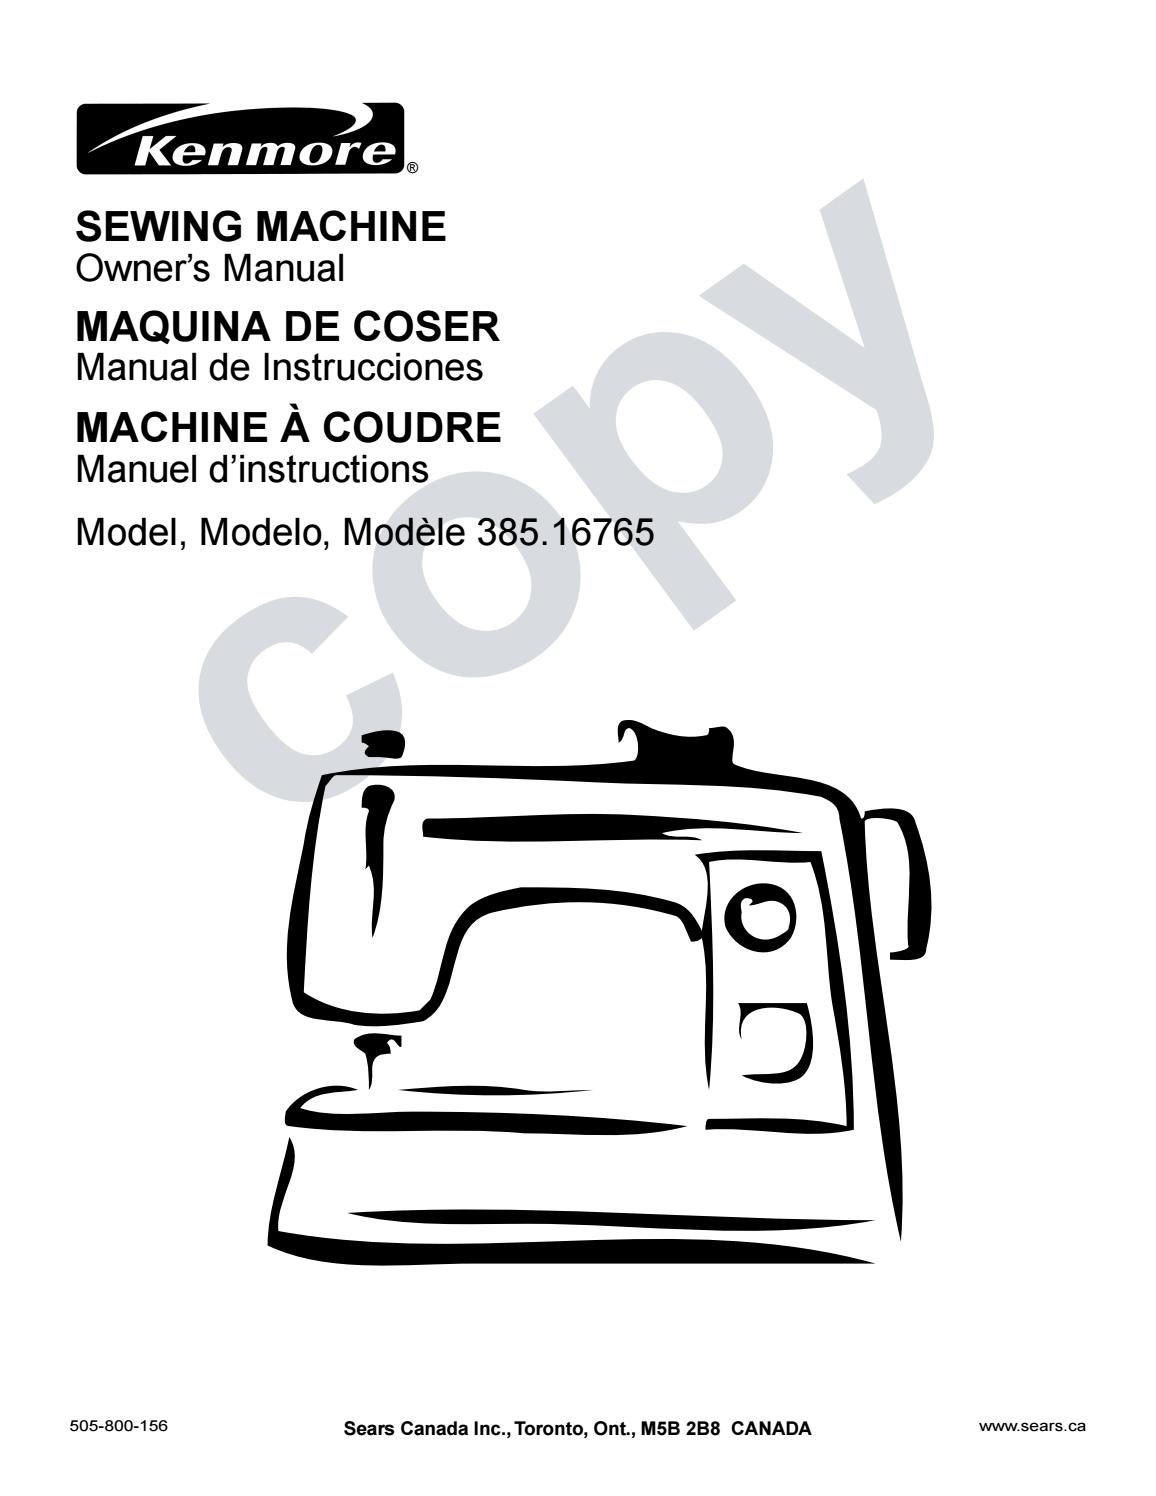 Comment Ventiler Un Garage Humide kenmore 385 16765 sewing machine user manualdavid